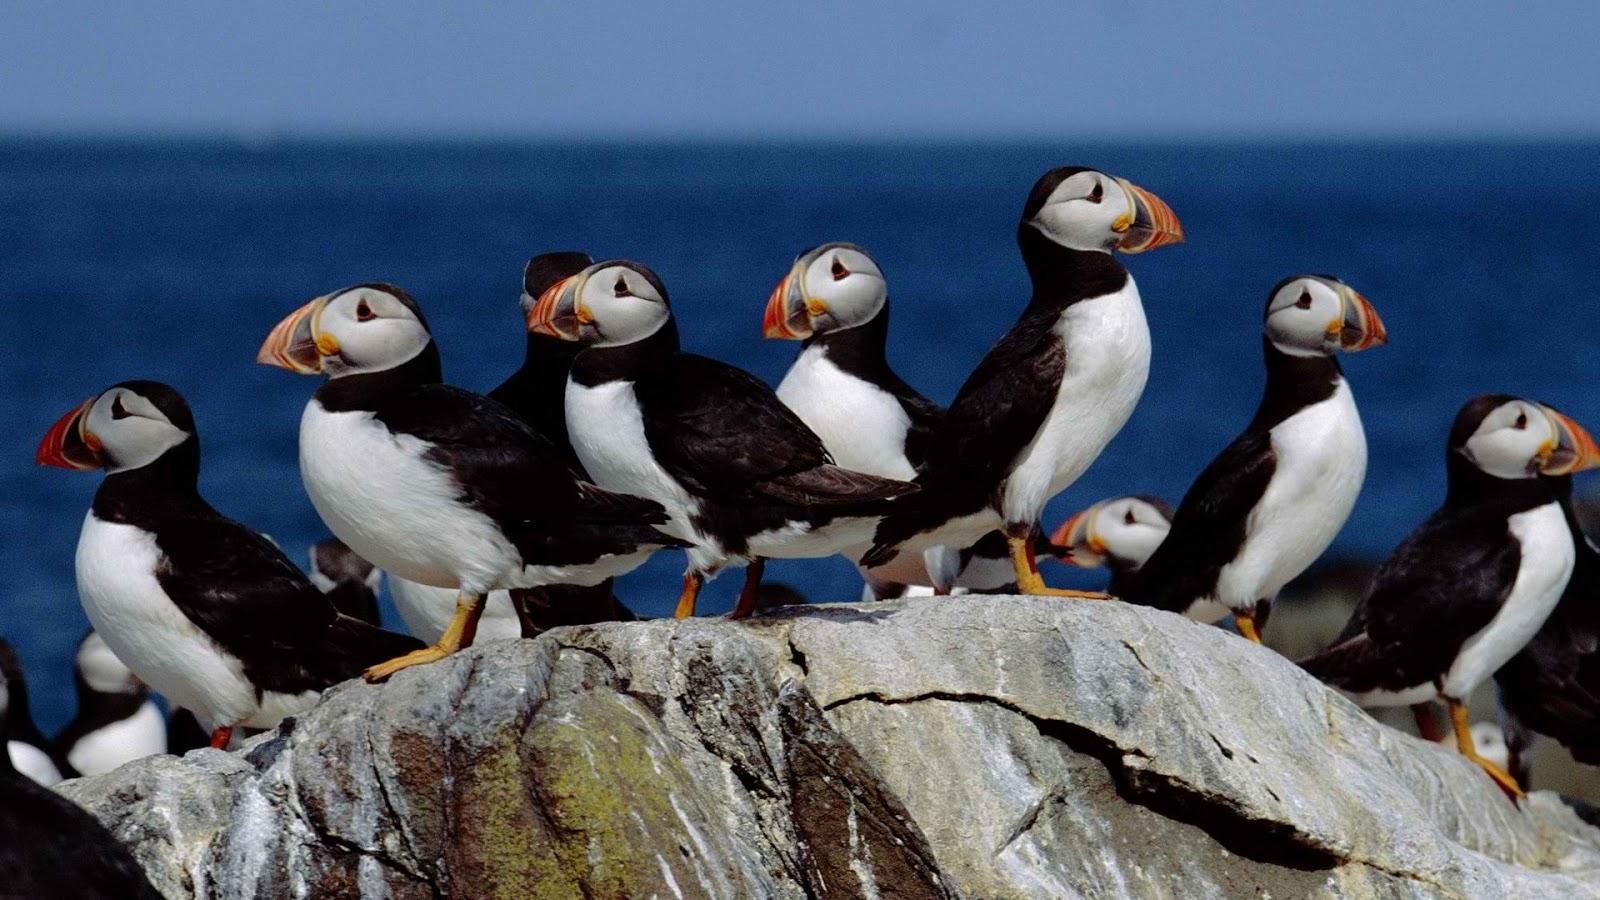 Seabird Atlantic Puffin miraculous wallpaper Animals & Birds